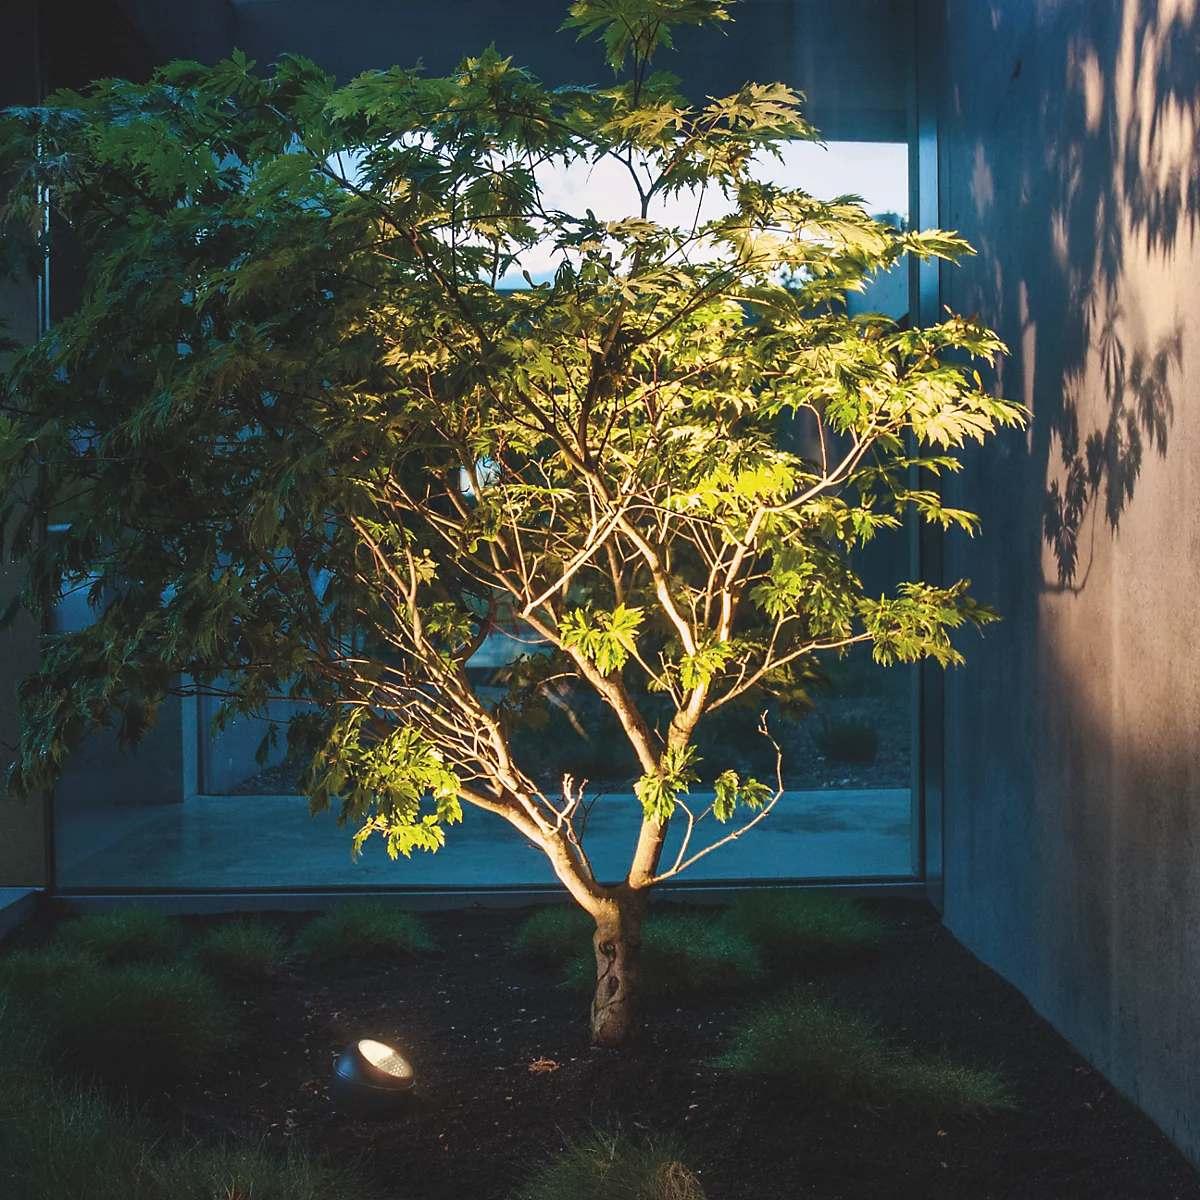 Valgustatud puu peegeldumine seinale - IP44.de Shot Connect Garden luminaire LED